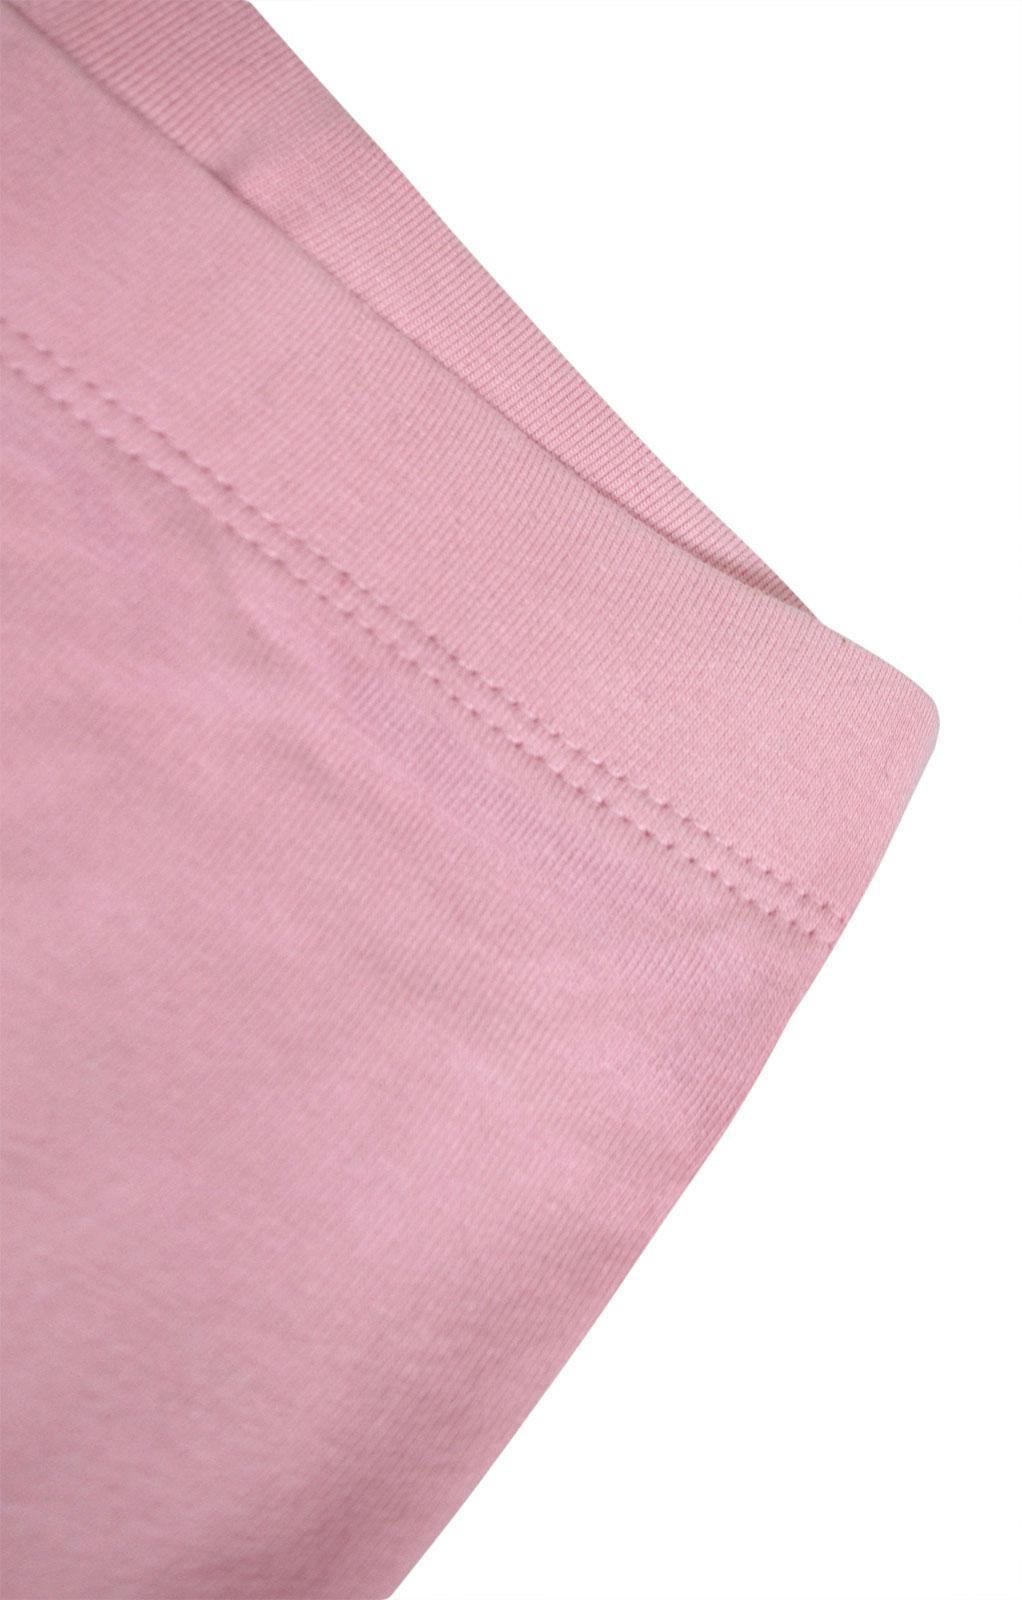 Girls-Next-Leggings-Kids-New-Pants-Age-2-3-4-5-6-7-8-9-10-11-12-13-14-15-16-Yrs thumbnail 24